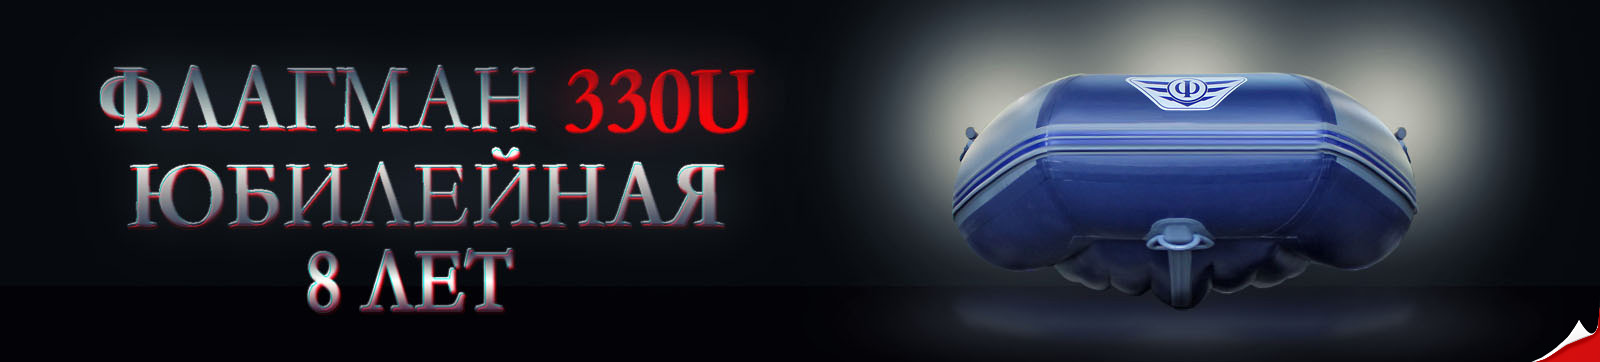 http://flagman-spb.ru/naduvnyie-lodki/naduvnyie-motornyie-lodki/flagman-330u/